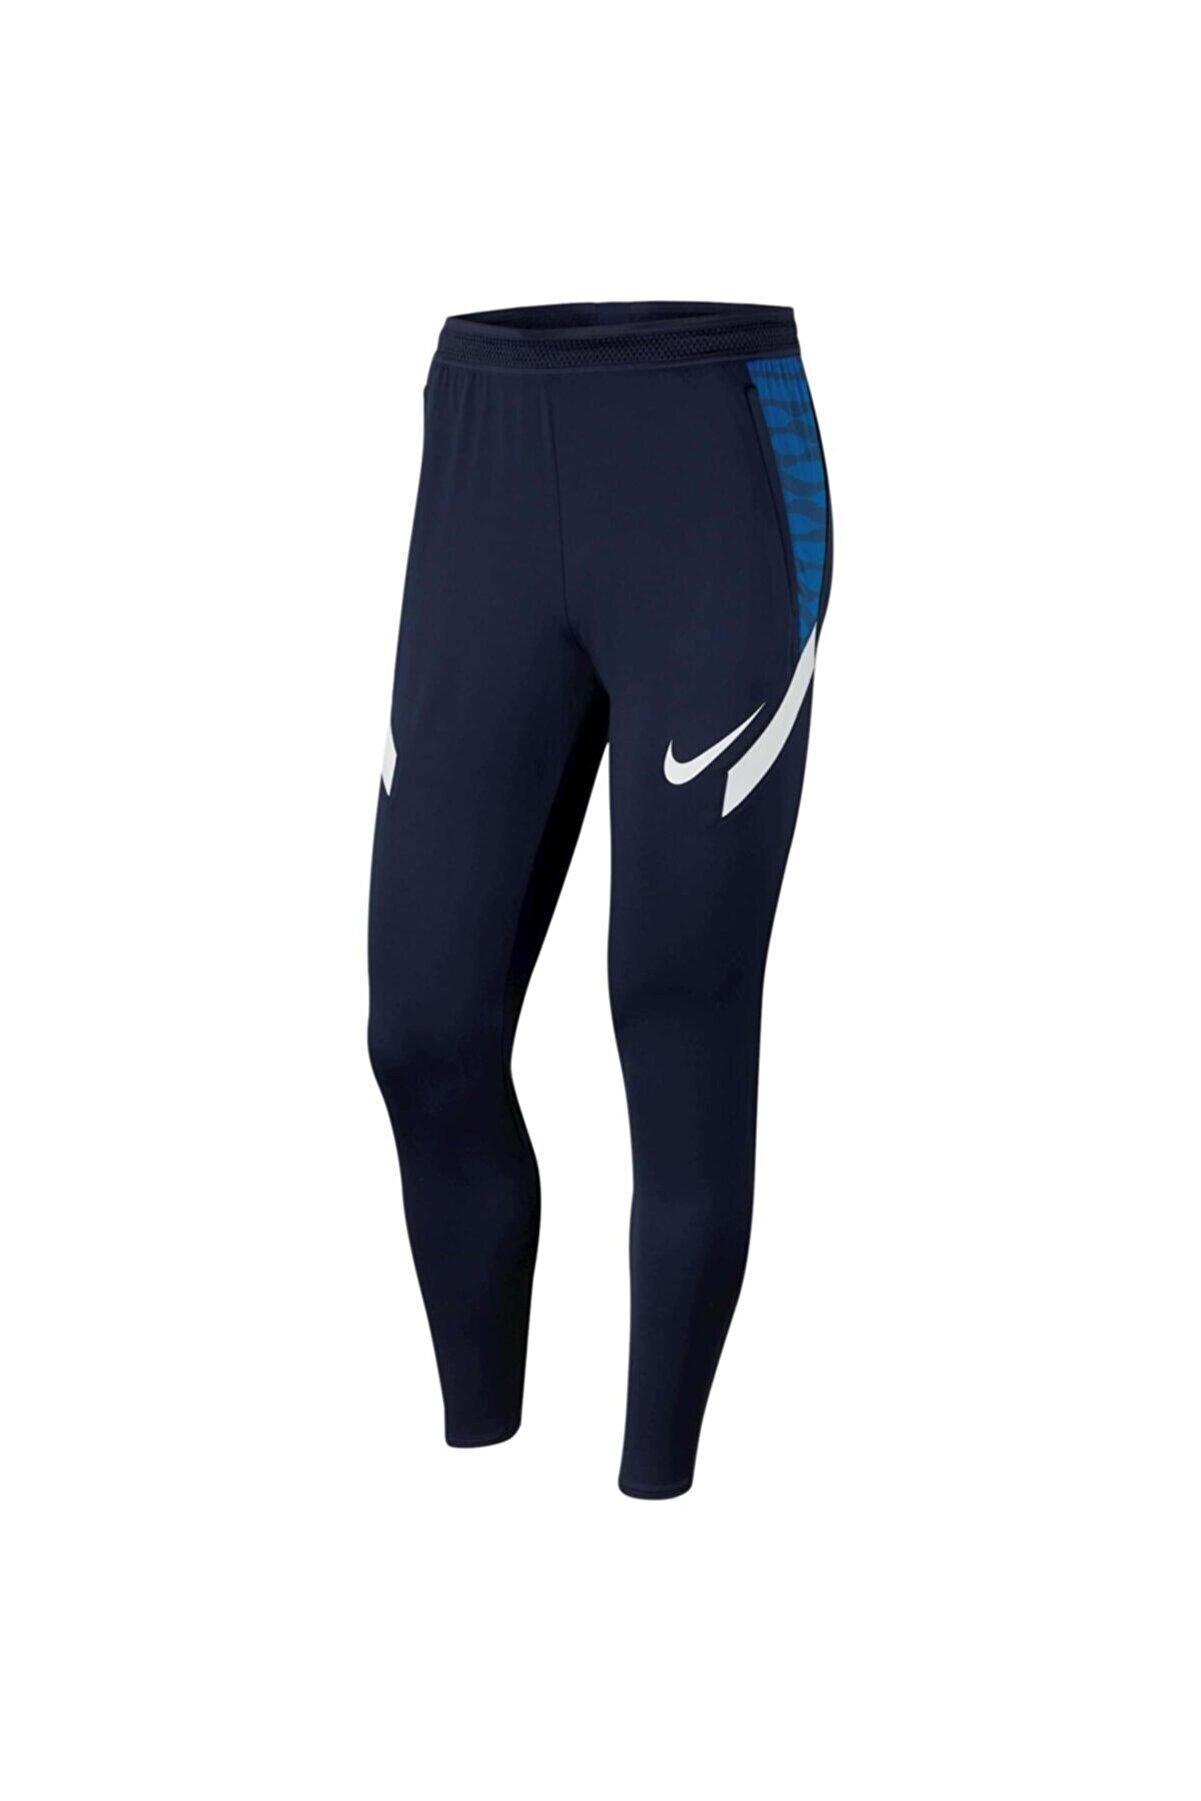 Nike Strike 21 Pant